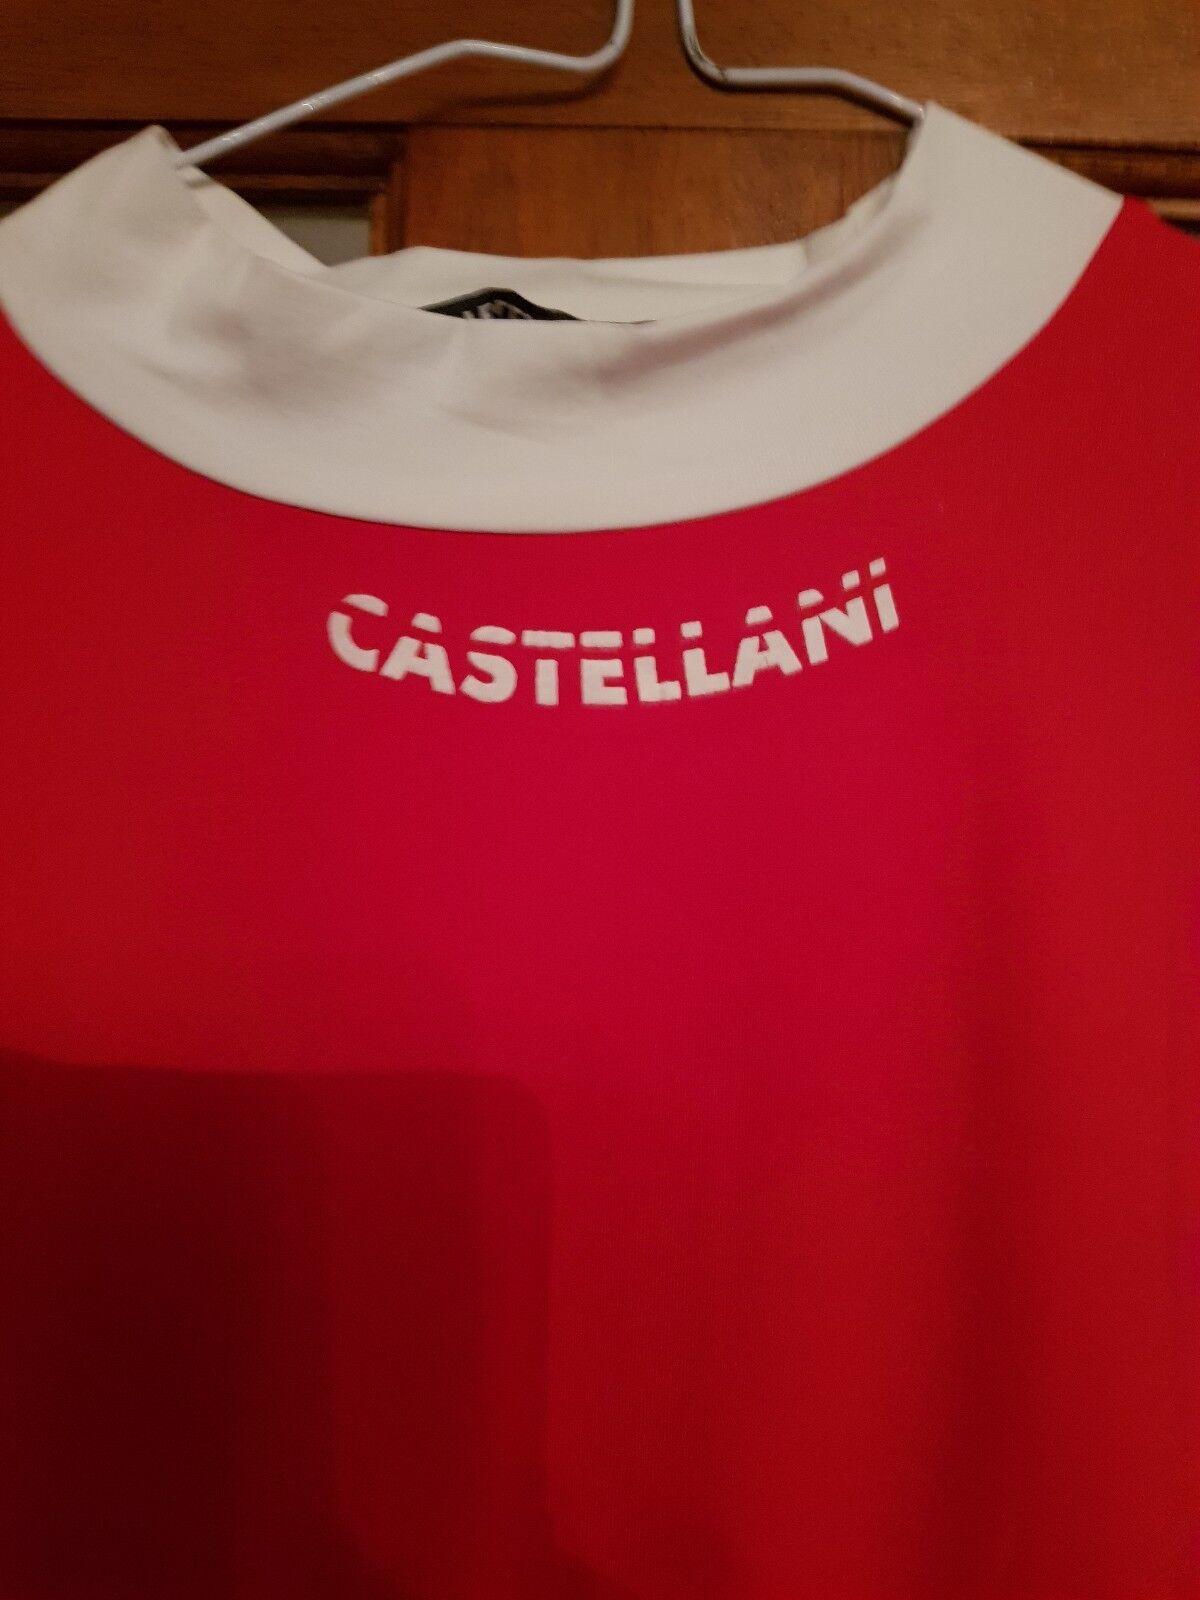 Castellani shooting long sleeve top clay pigeon shooting in xxl